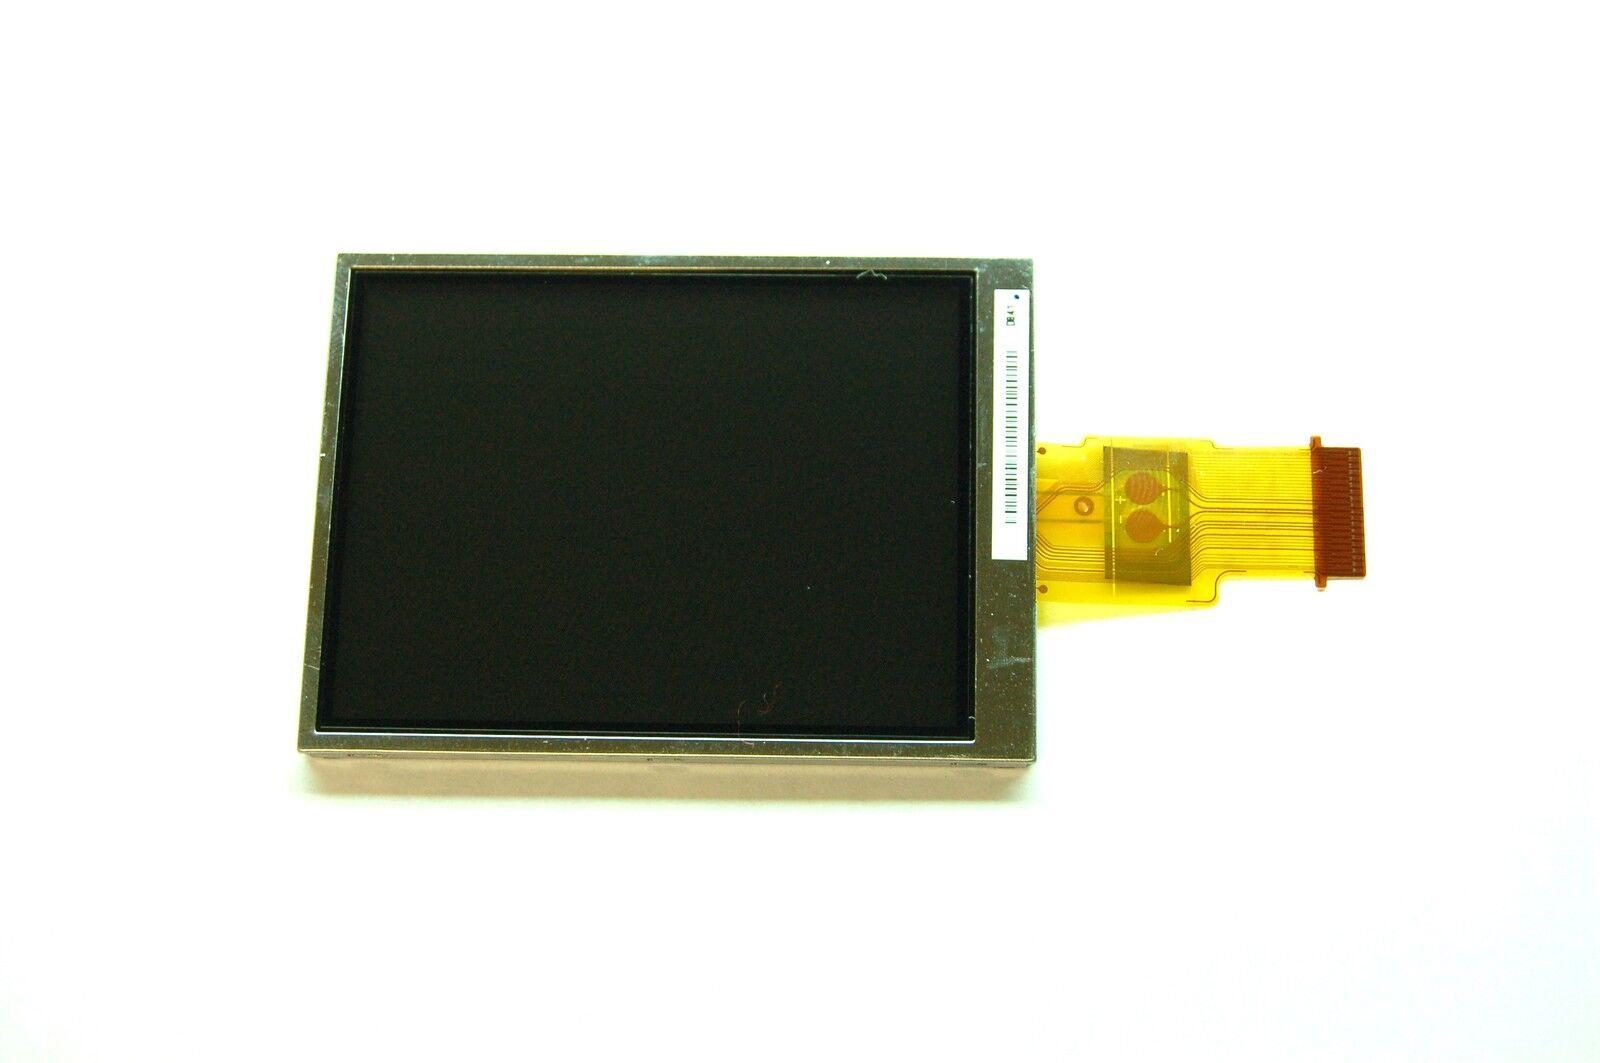 Olympus Fe-370 Fe-5010 Lcd Display Screen Monitor